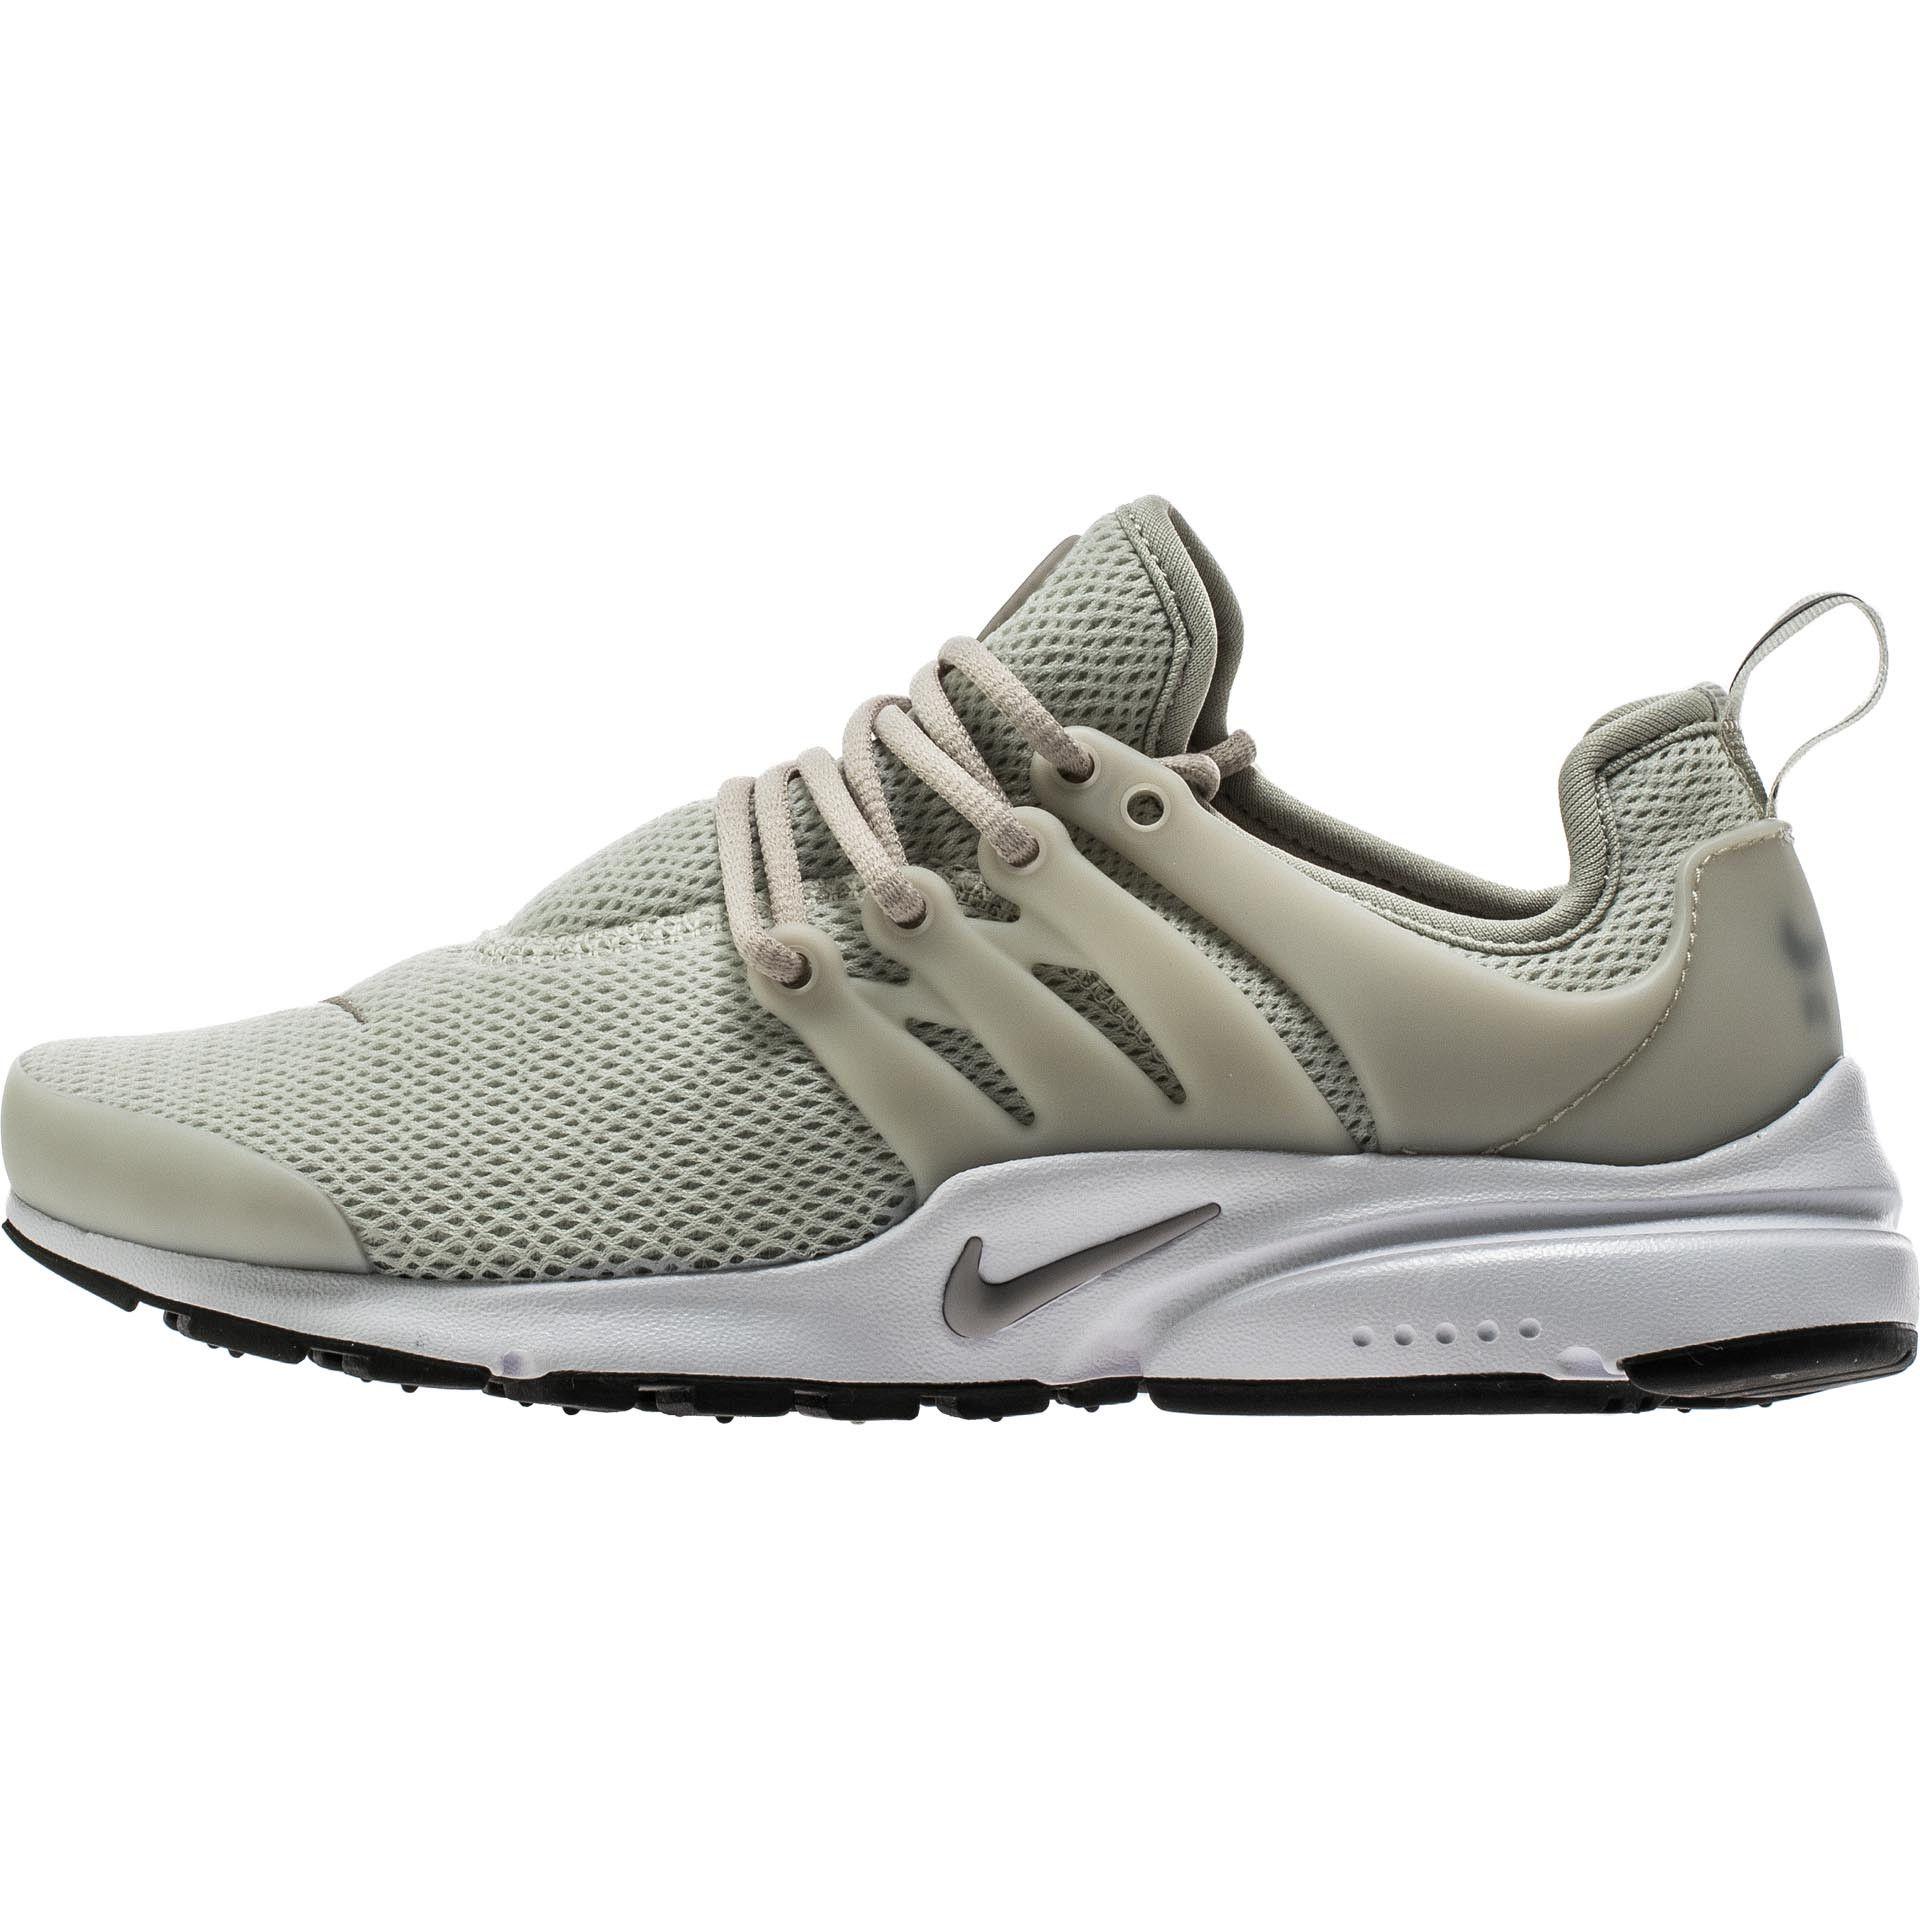 T-chaussures Zapatillas Se Promener W Eu Beige 40 (uk) 6,5